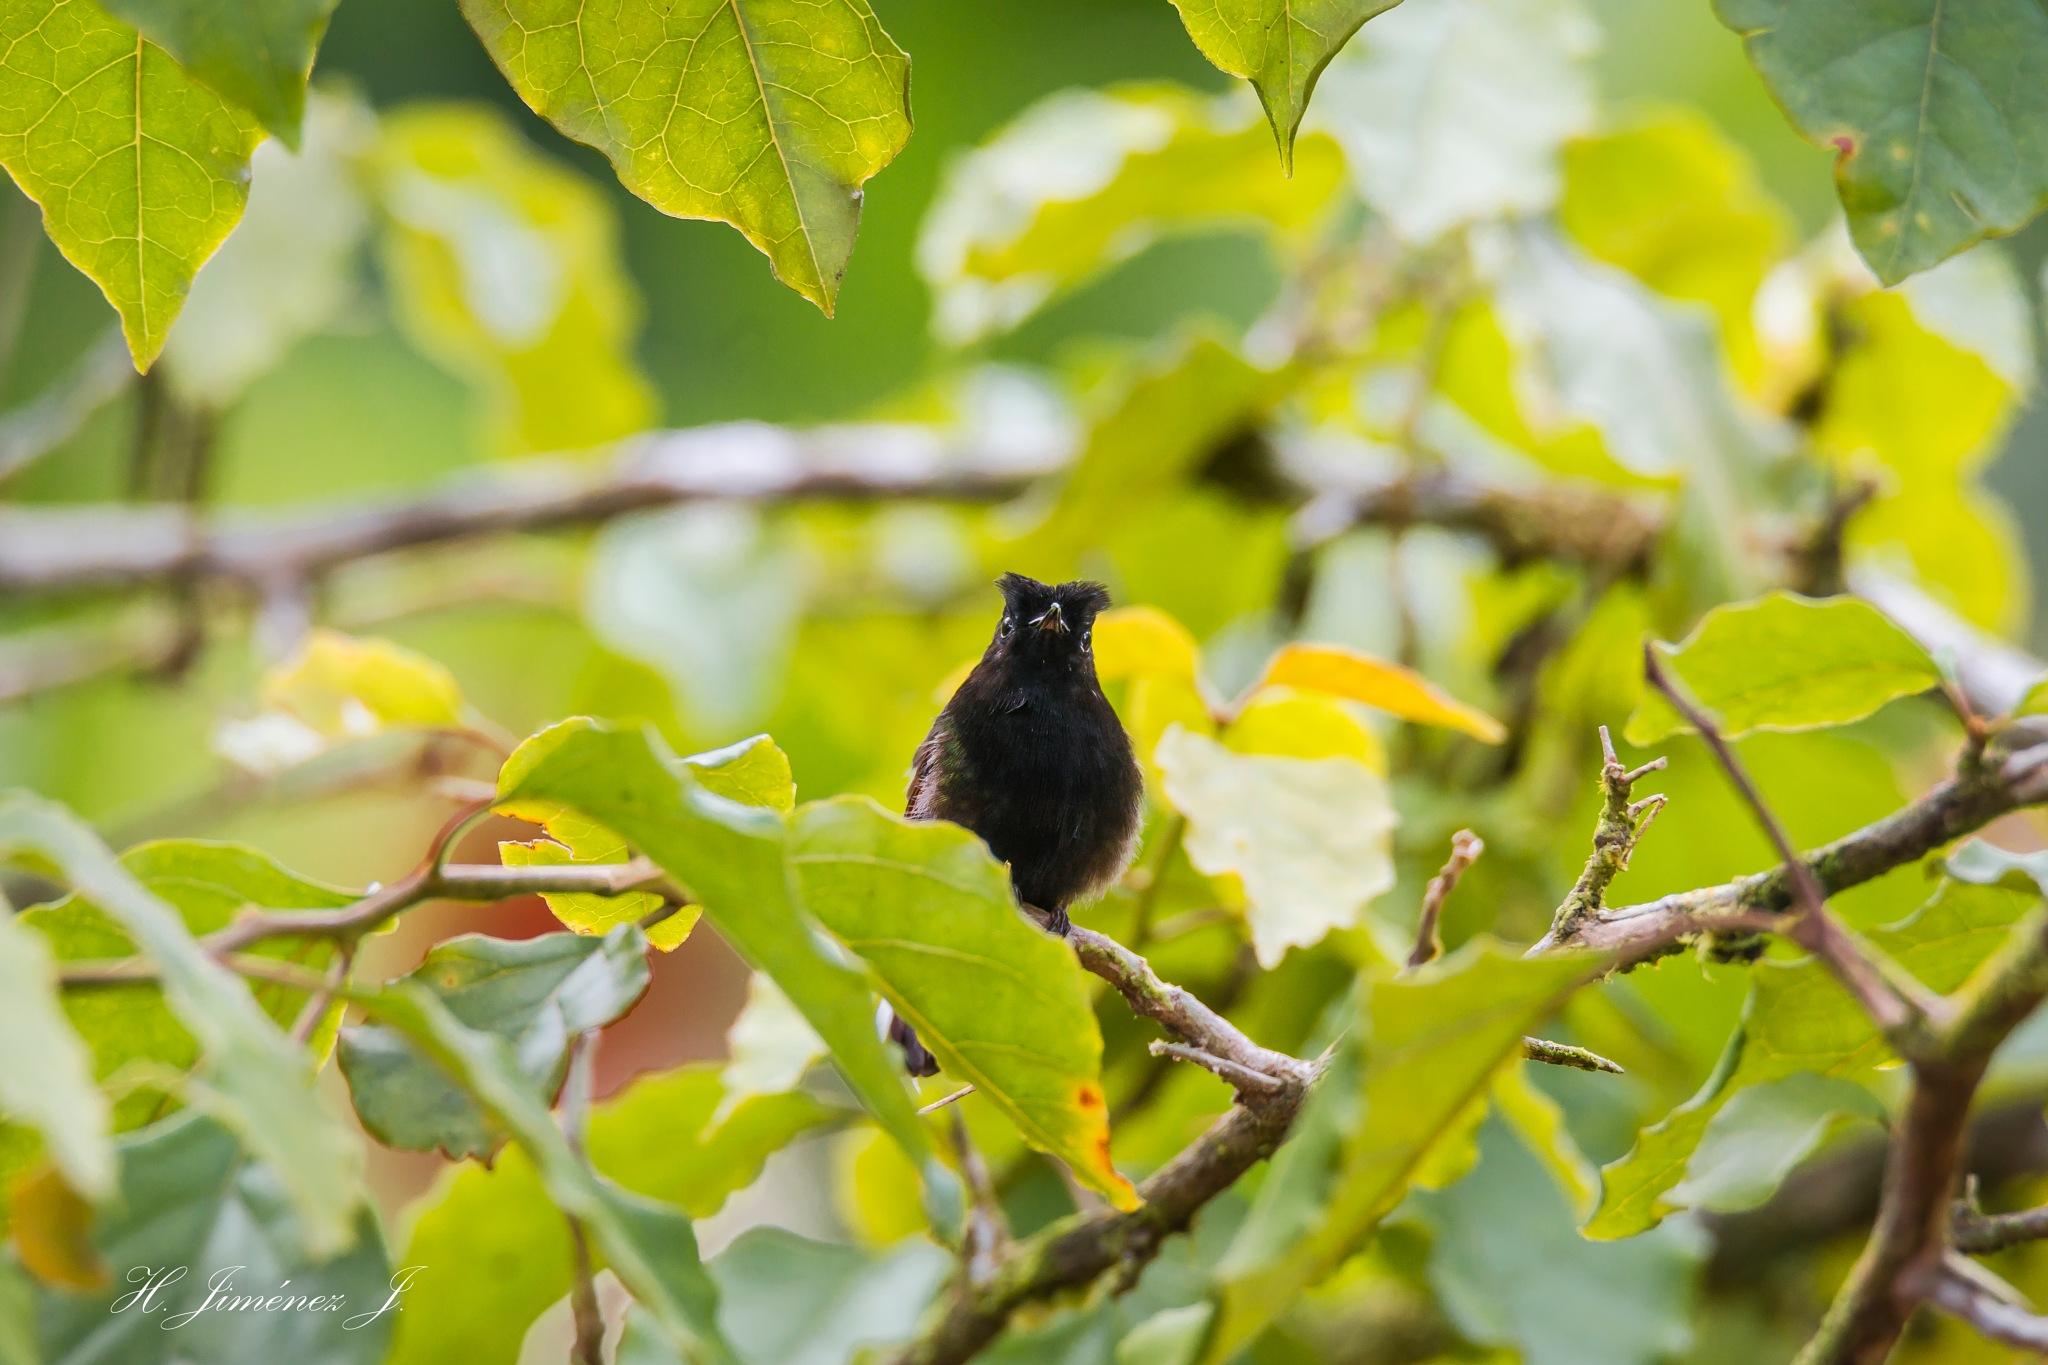 Black-bellied Hummingbird (male). by Henry Jiménez J